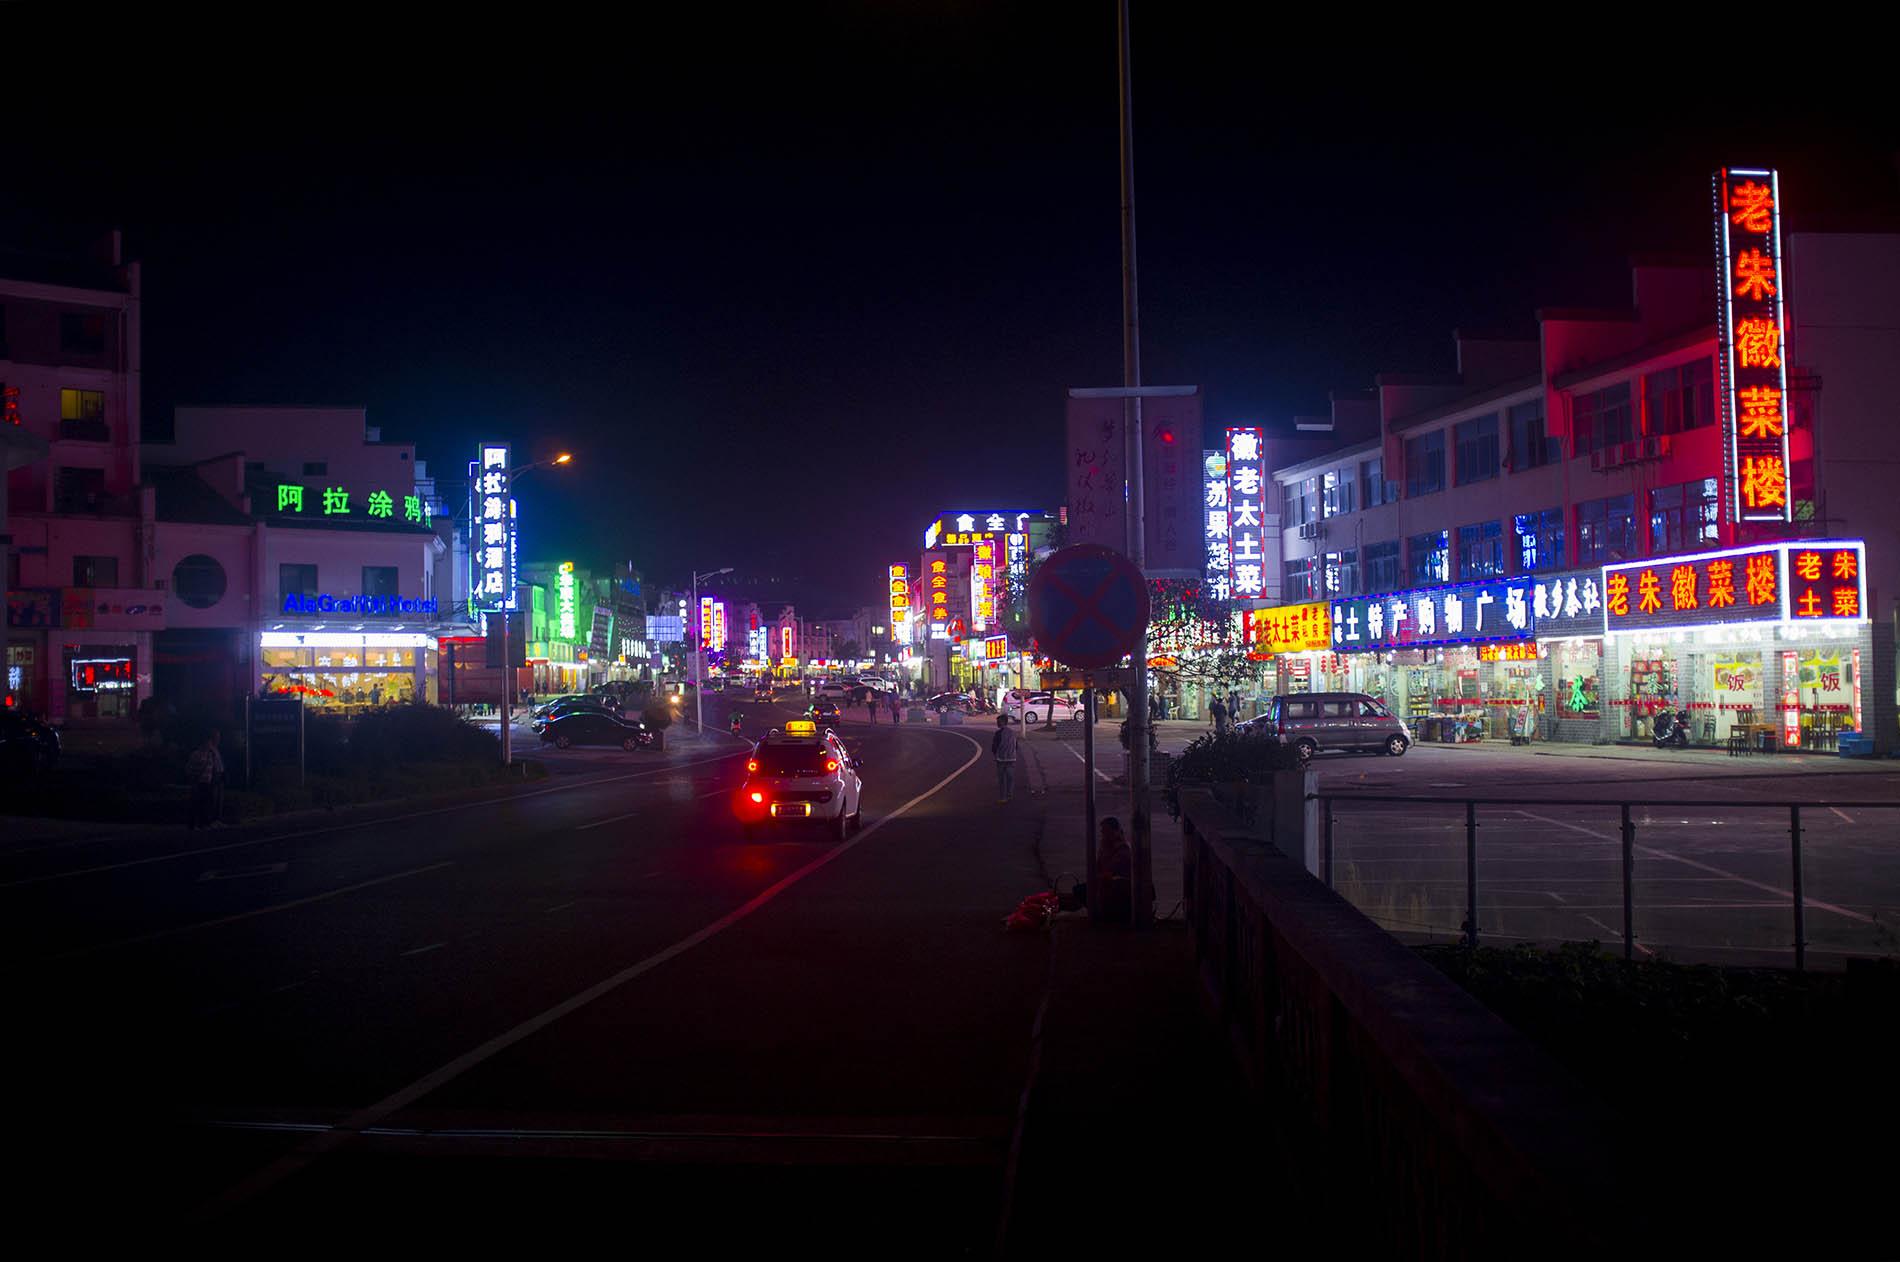 Tunxi by night.